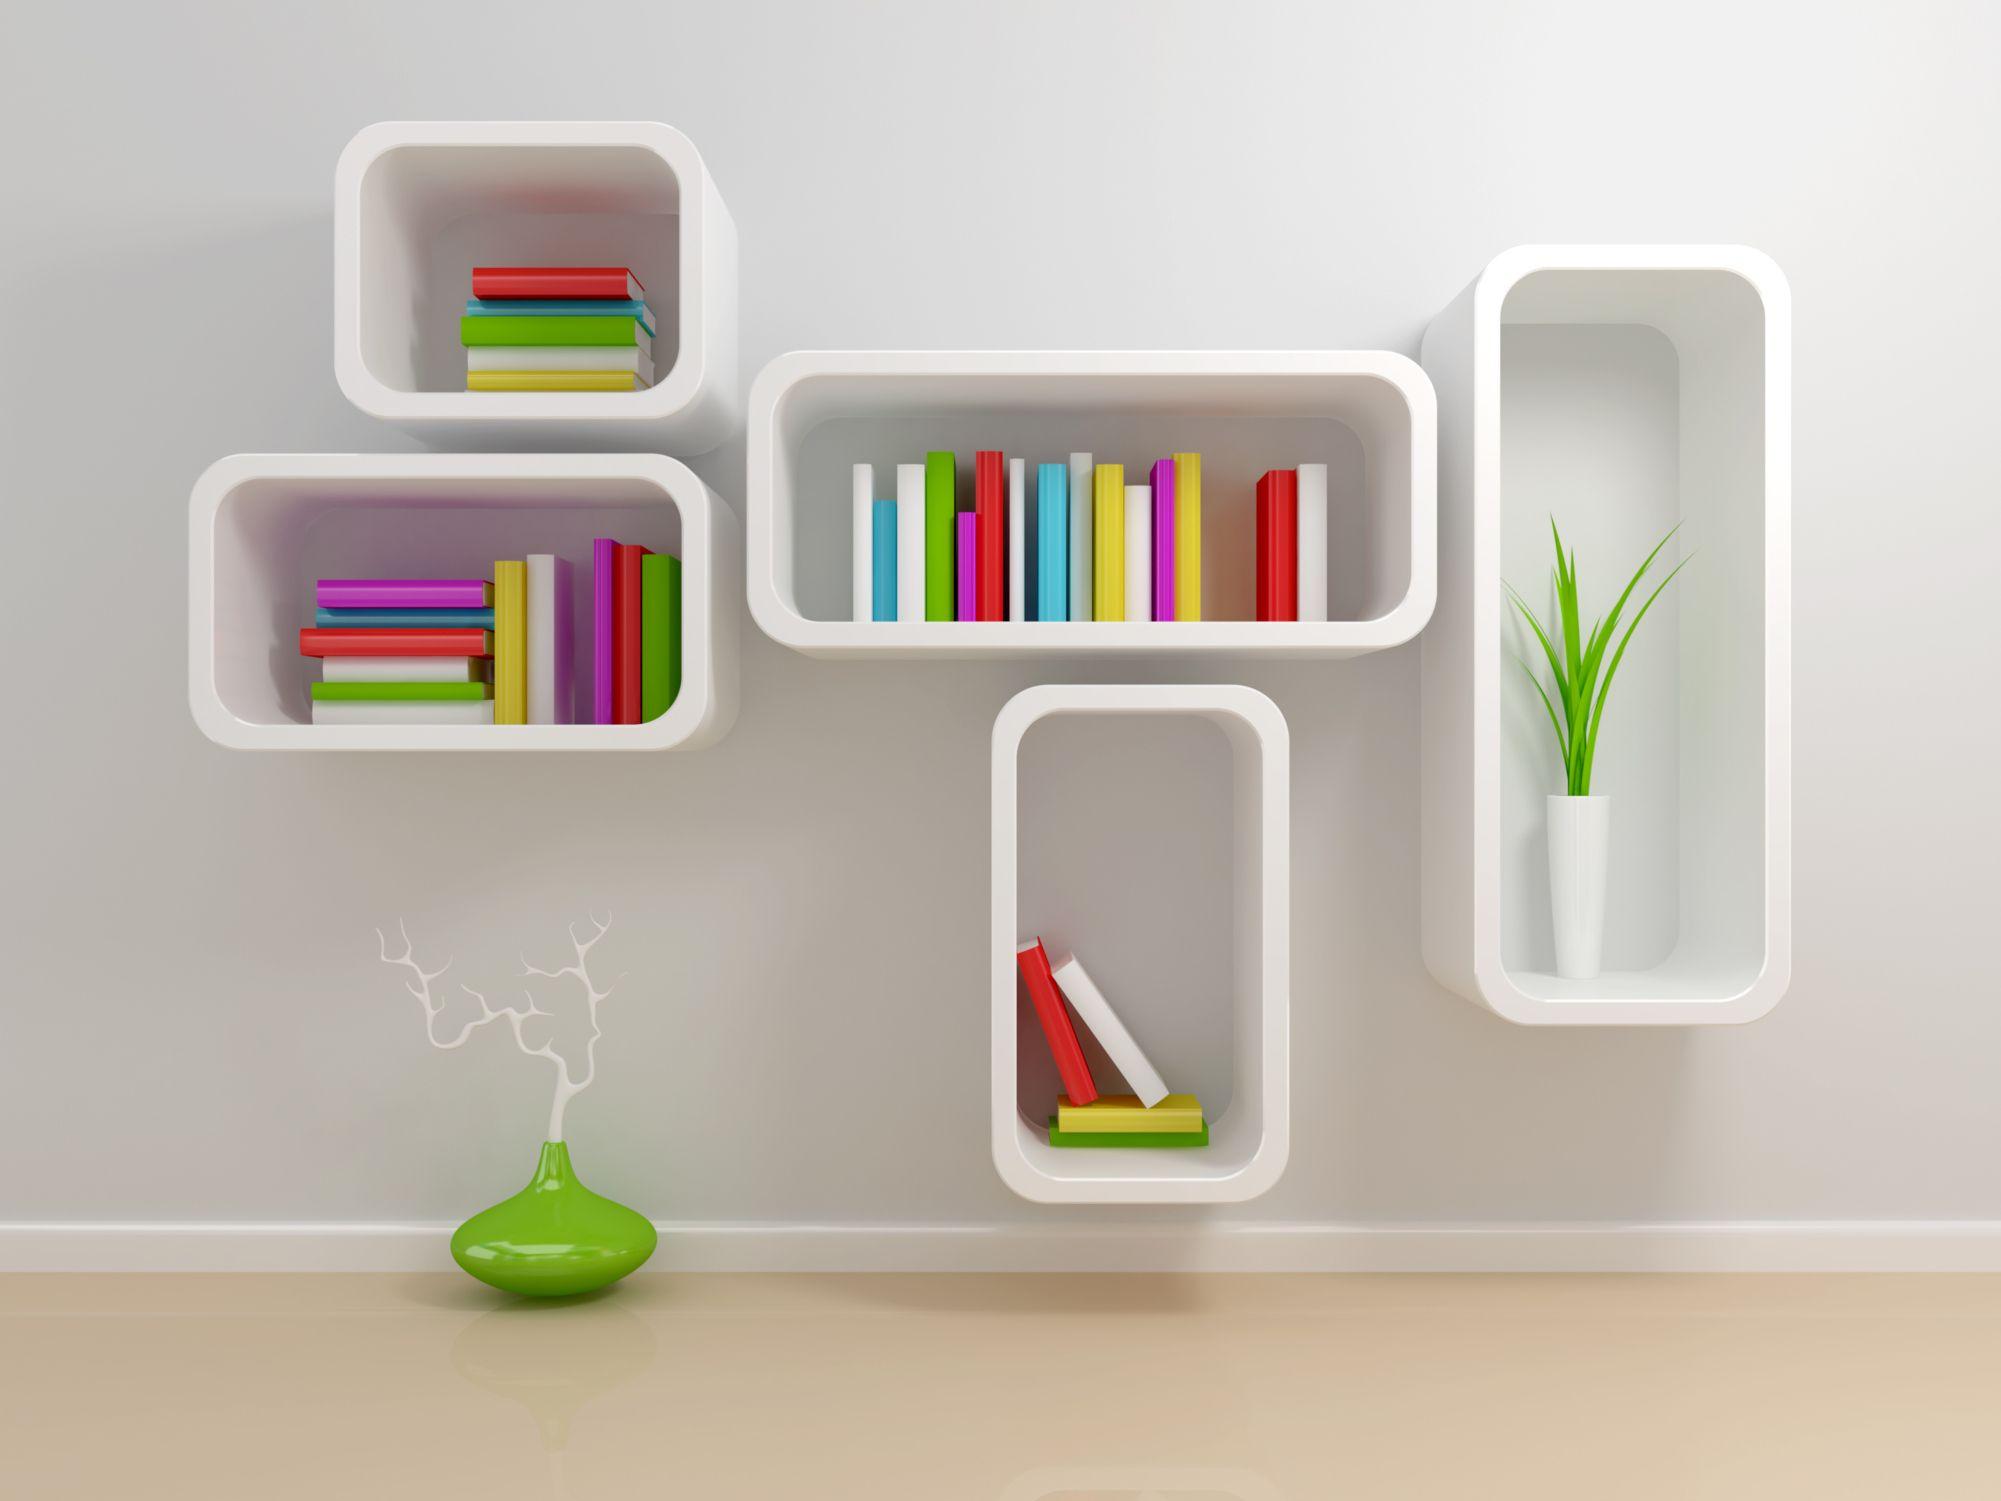 Decoration, Fancy Minimalist Modern Bookshelf Designs In Wall Decor  Colorful Books Bright Interior Small Green Floral Vase ~ Wonderful Bookshelf  Design In ...